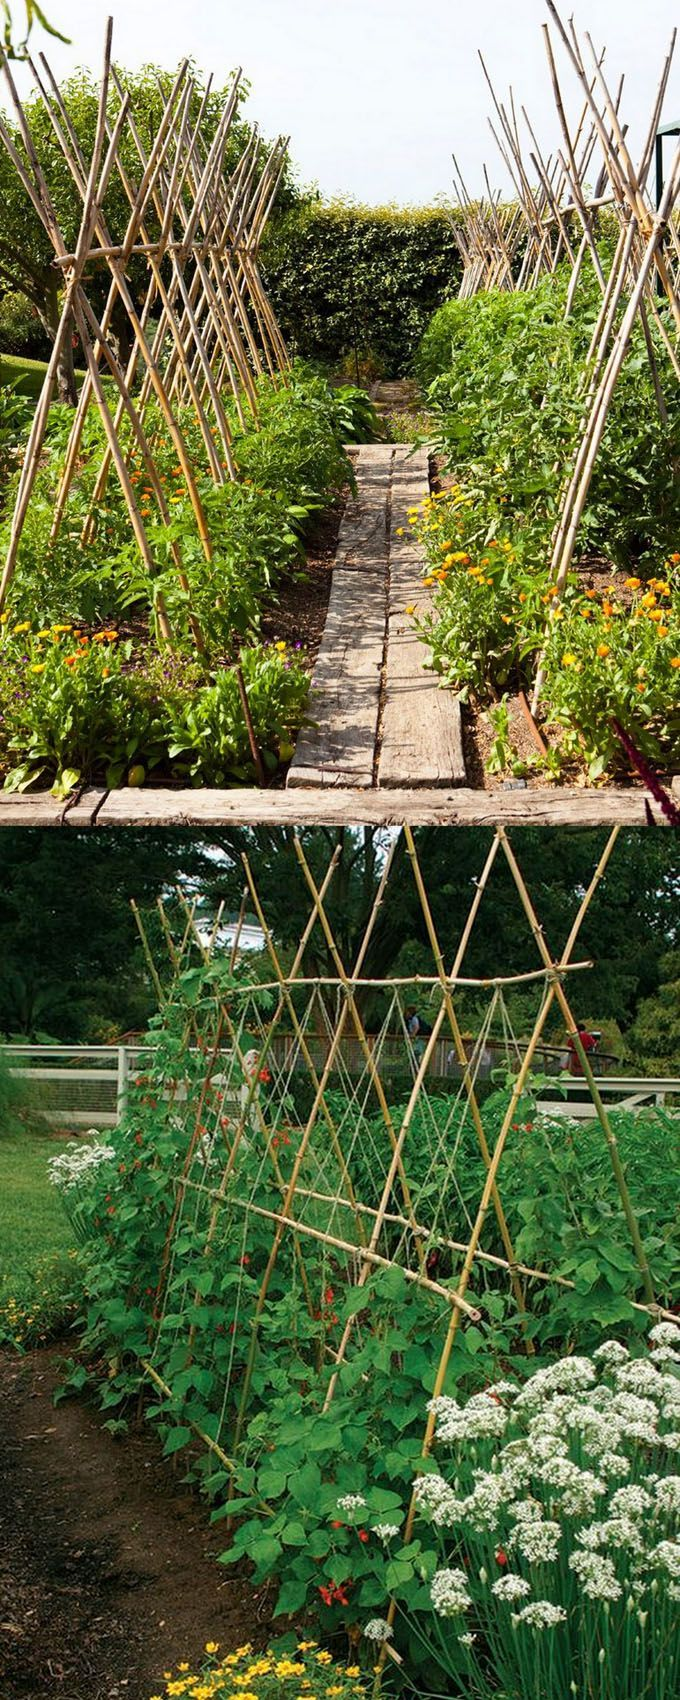 best ideas about garden projects on pinterest diy garden projects